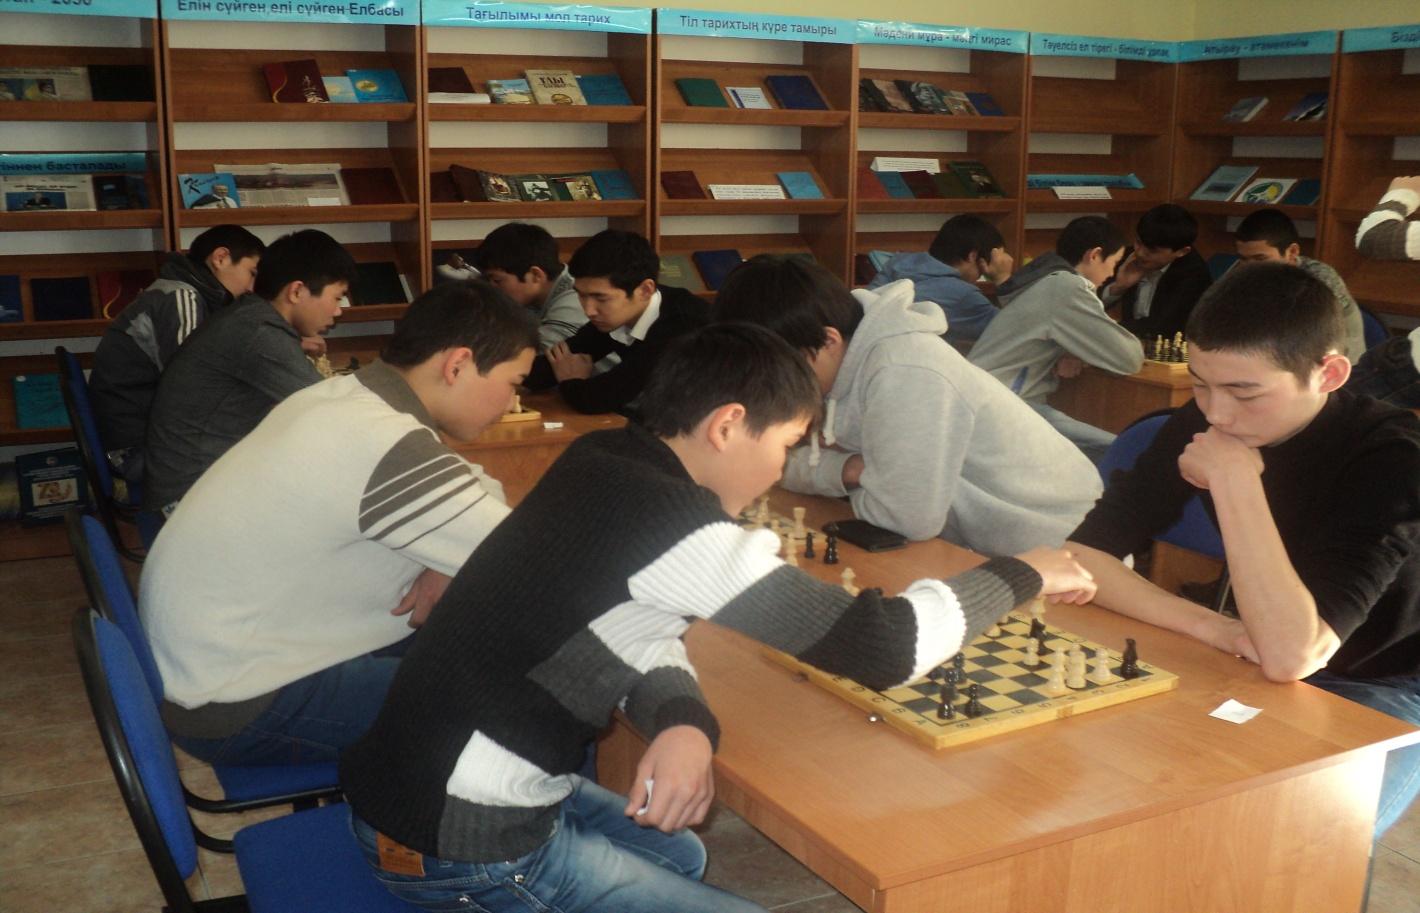 C:\Users\Гадилбек\Desktop\шахмат-2014\DSC07178.JPG